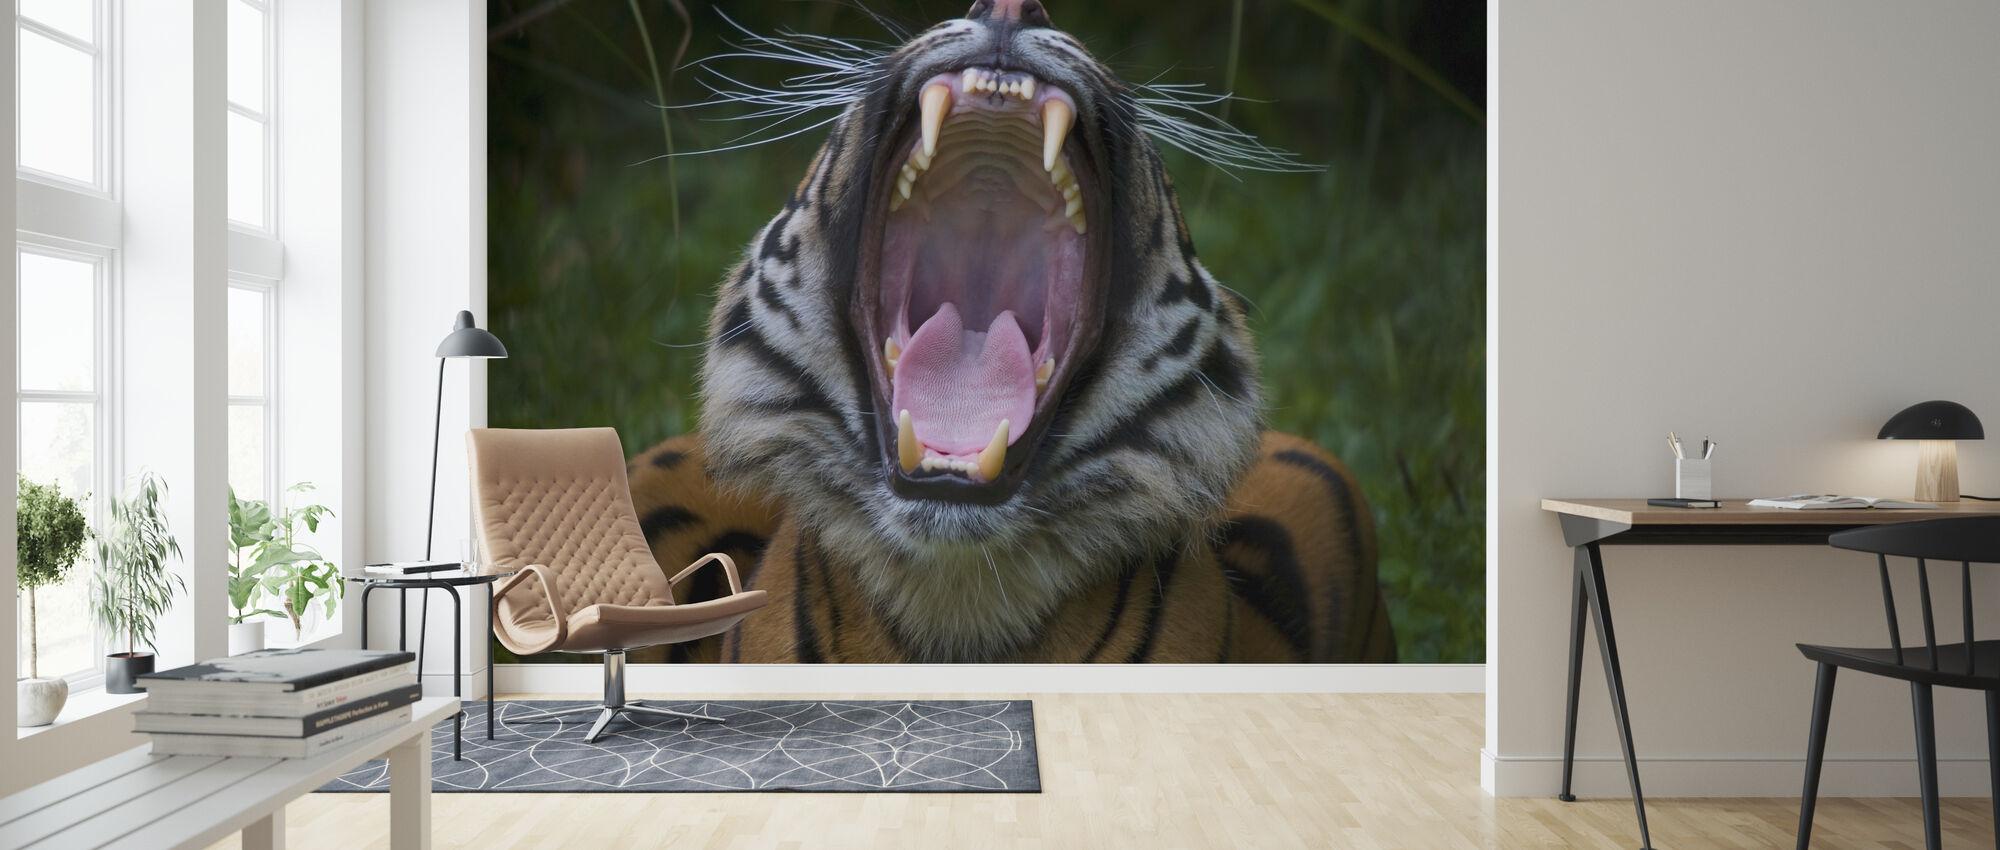 Yawning Tiger - Wallpaper - Living Room